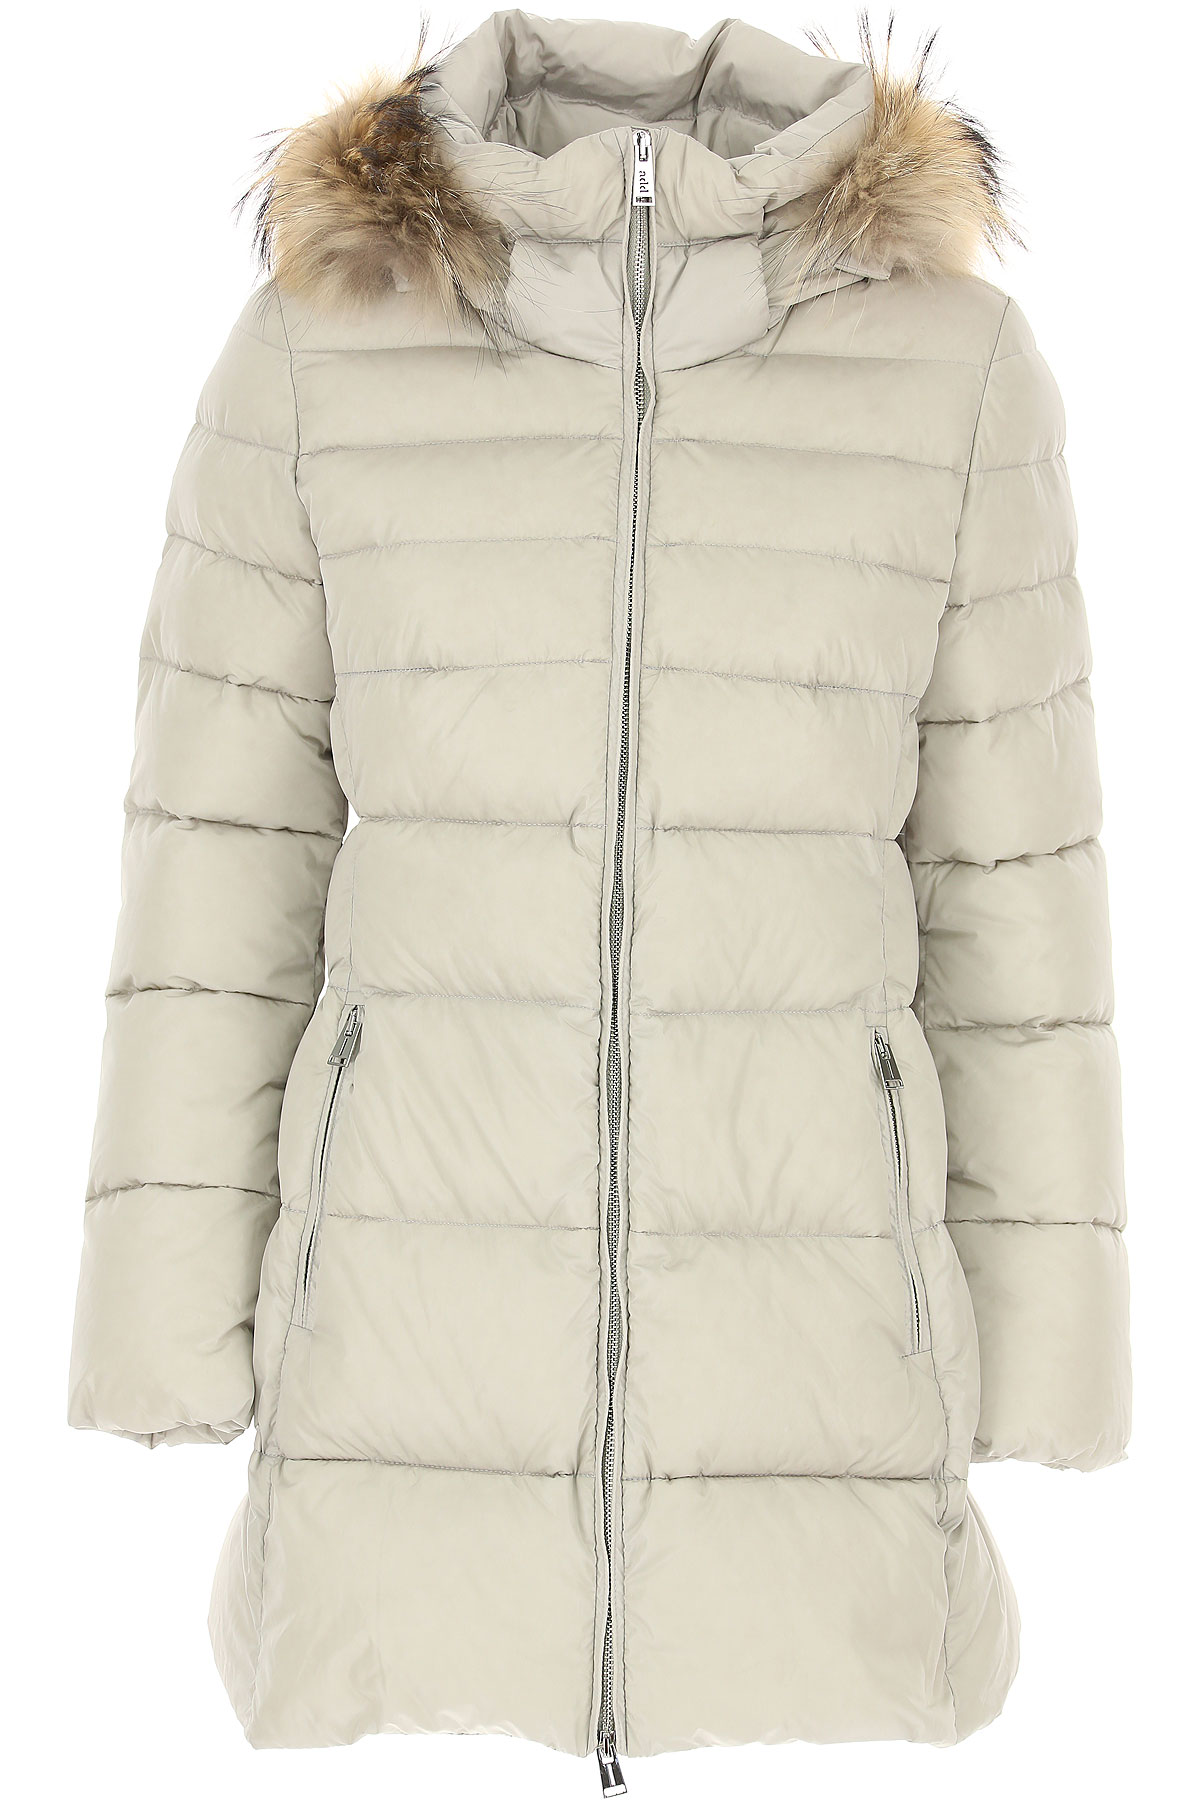 Image of ADD Down Jacket for Women, Puffer Ski Jacket, Grey, polyamide, 2017, 10 12 8